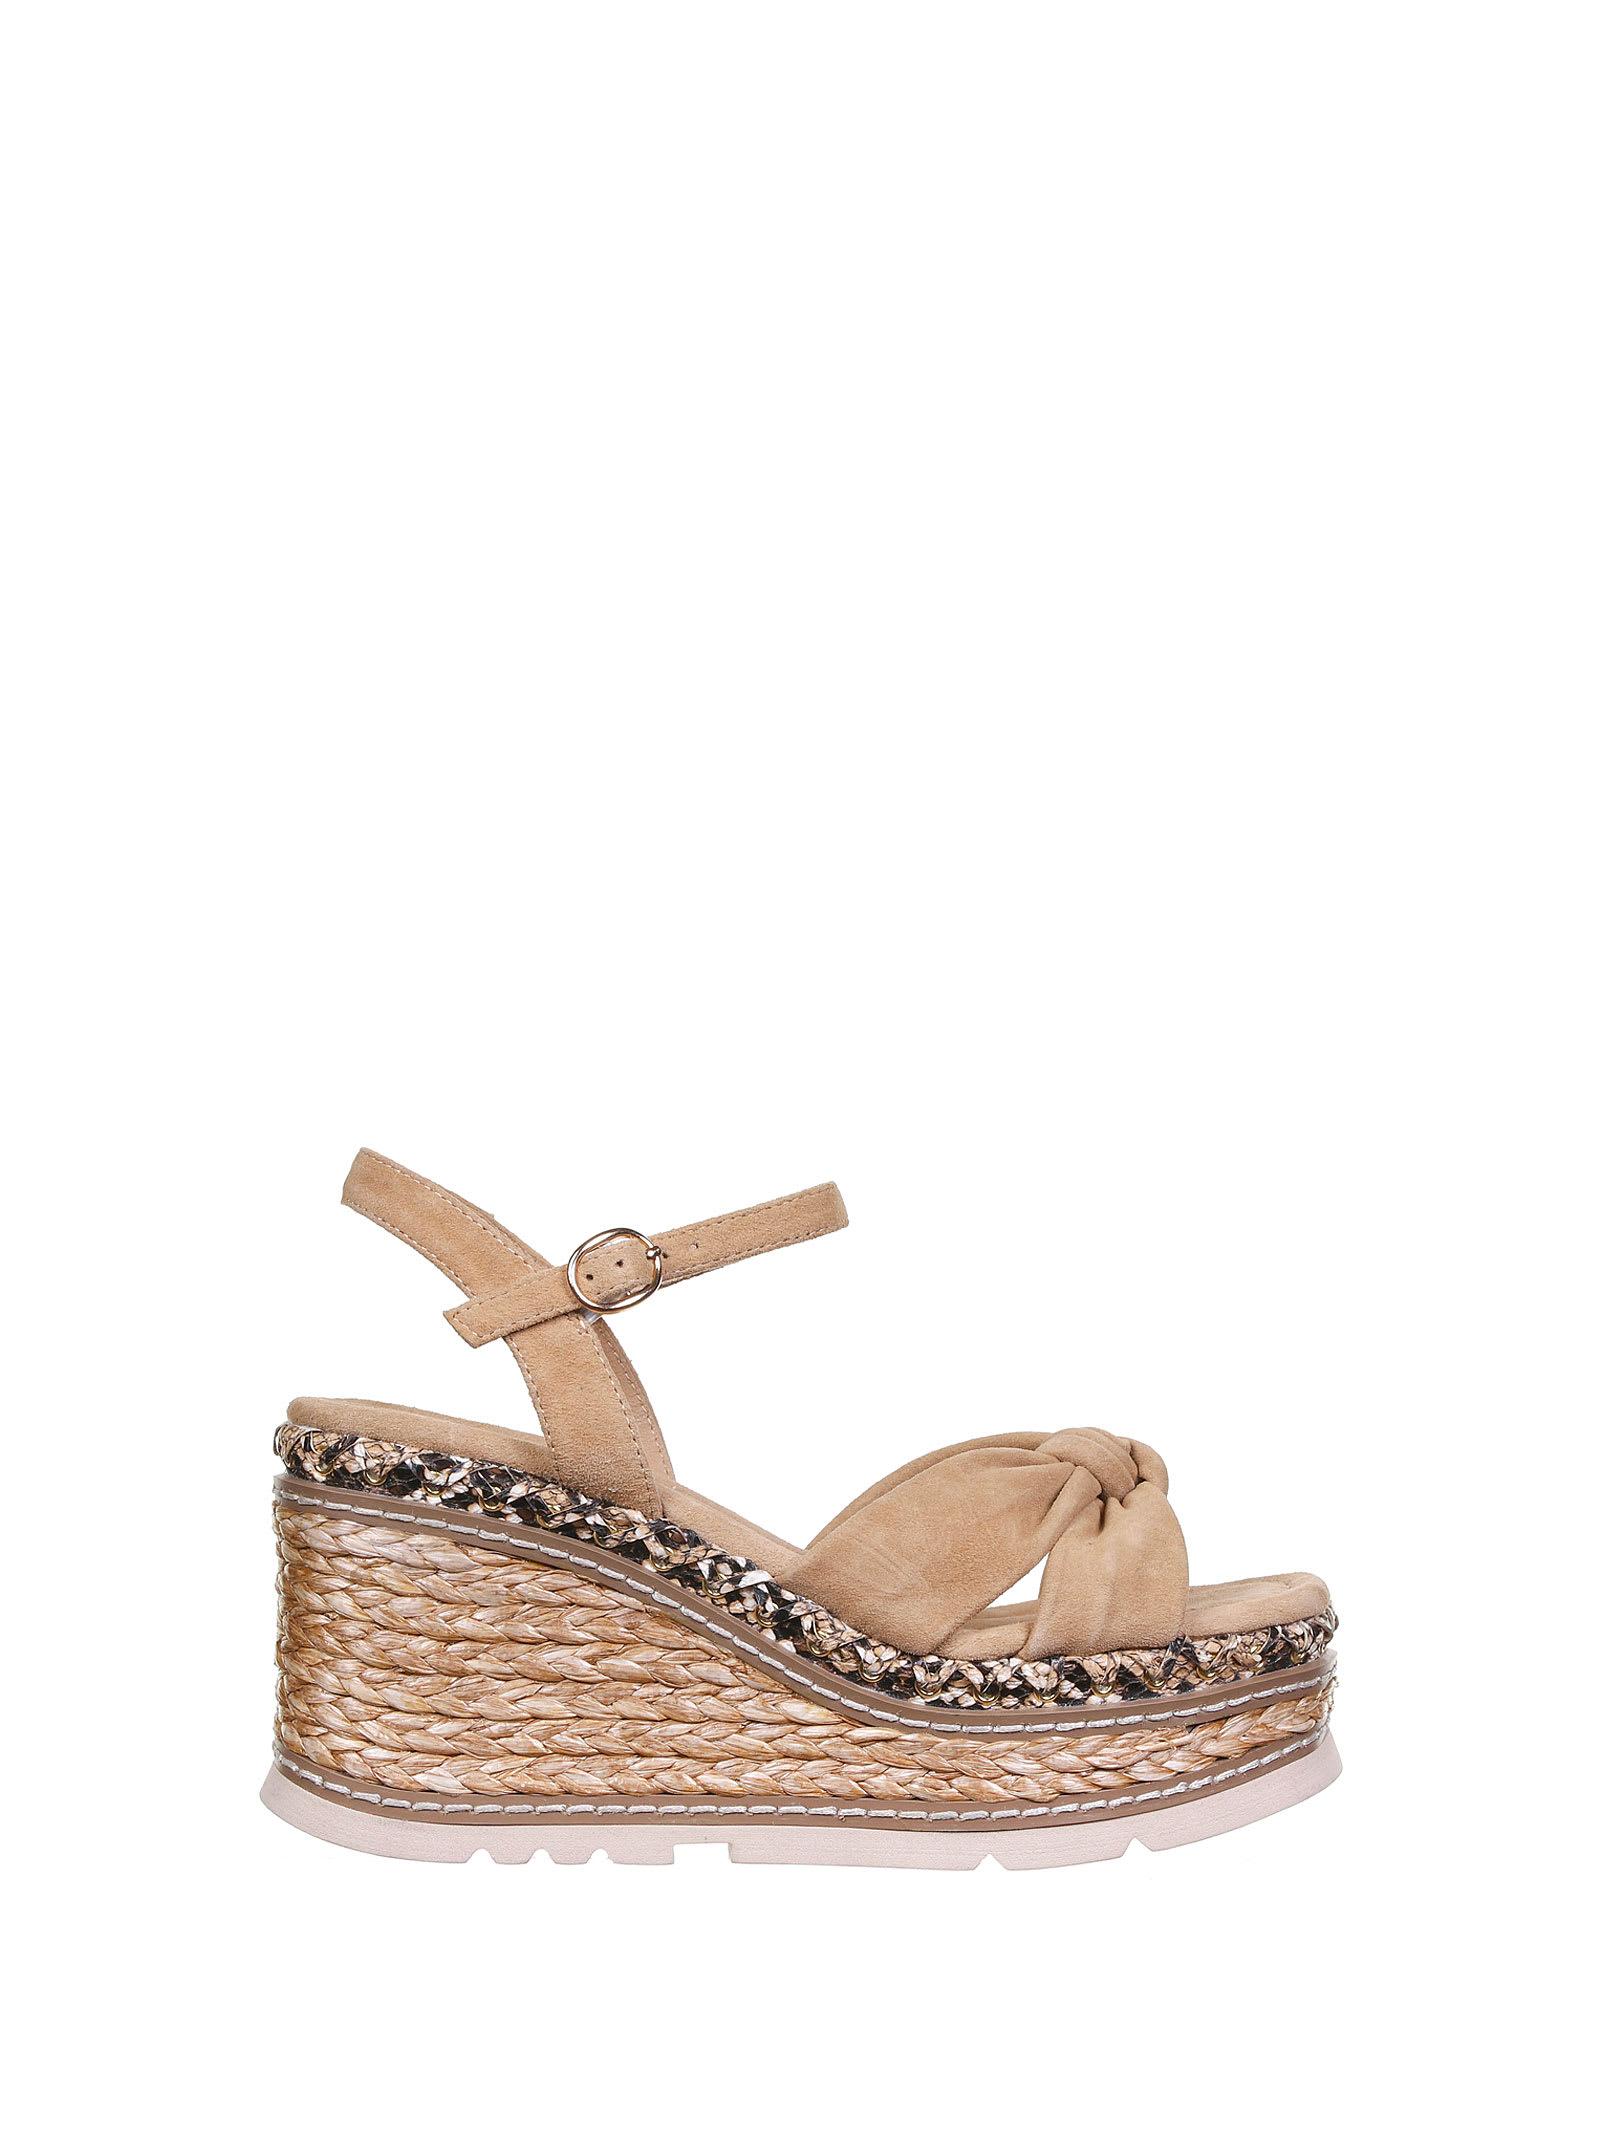 Honey Wedge Sandals